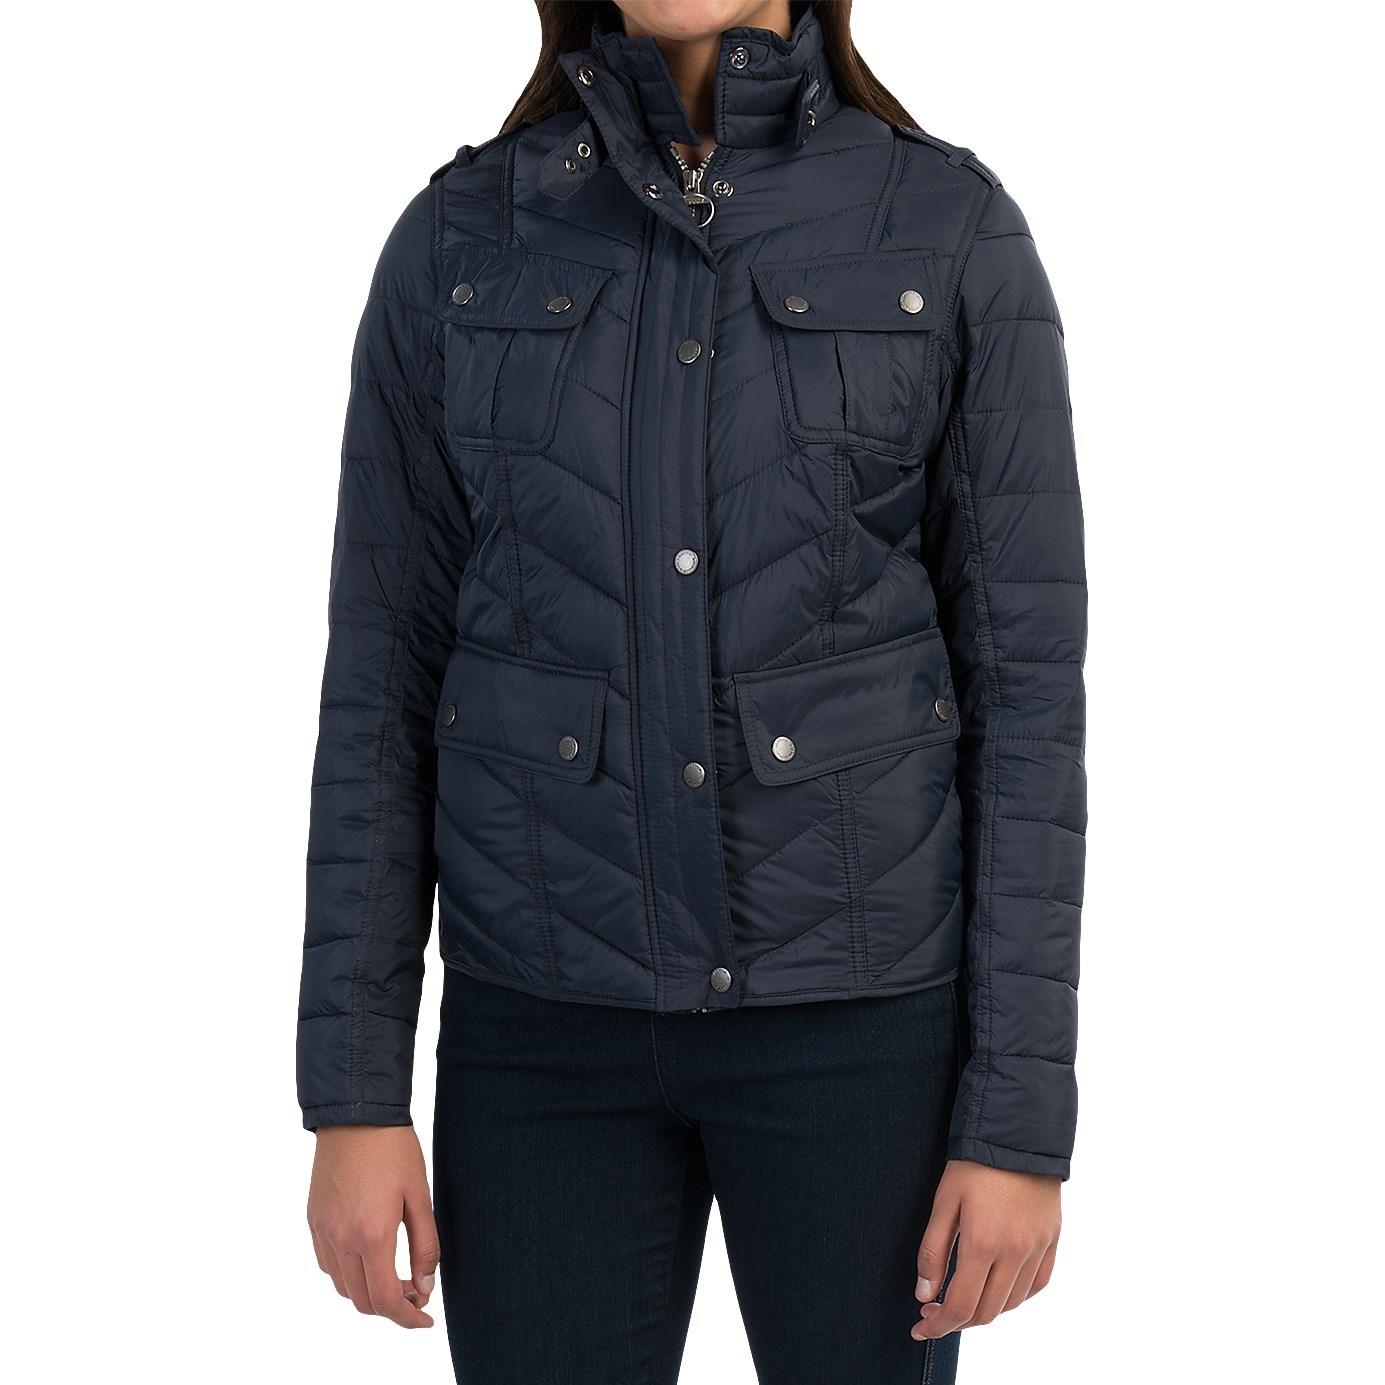 Barbour Vision Boulevard Moto Jacket For Women 8668t